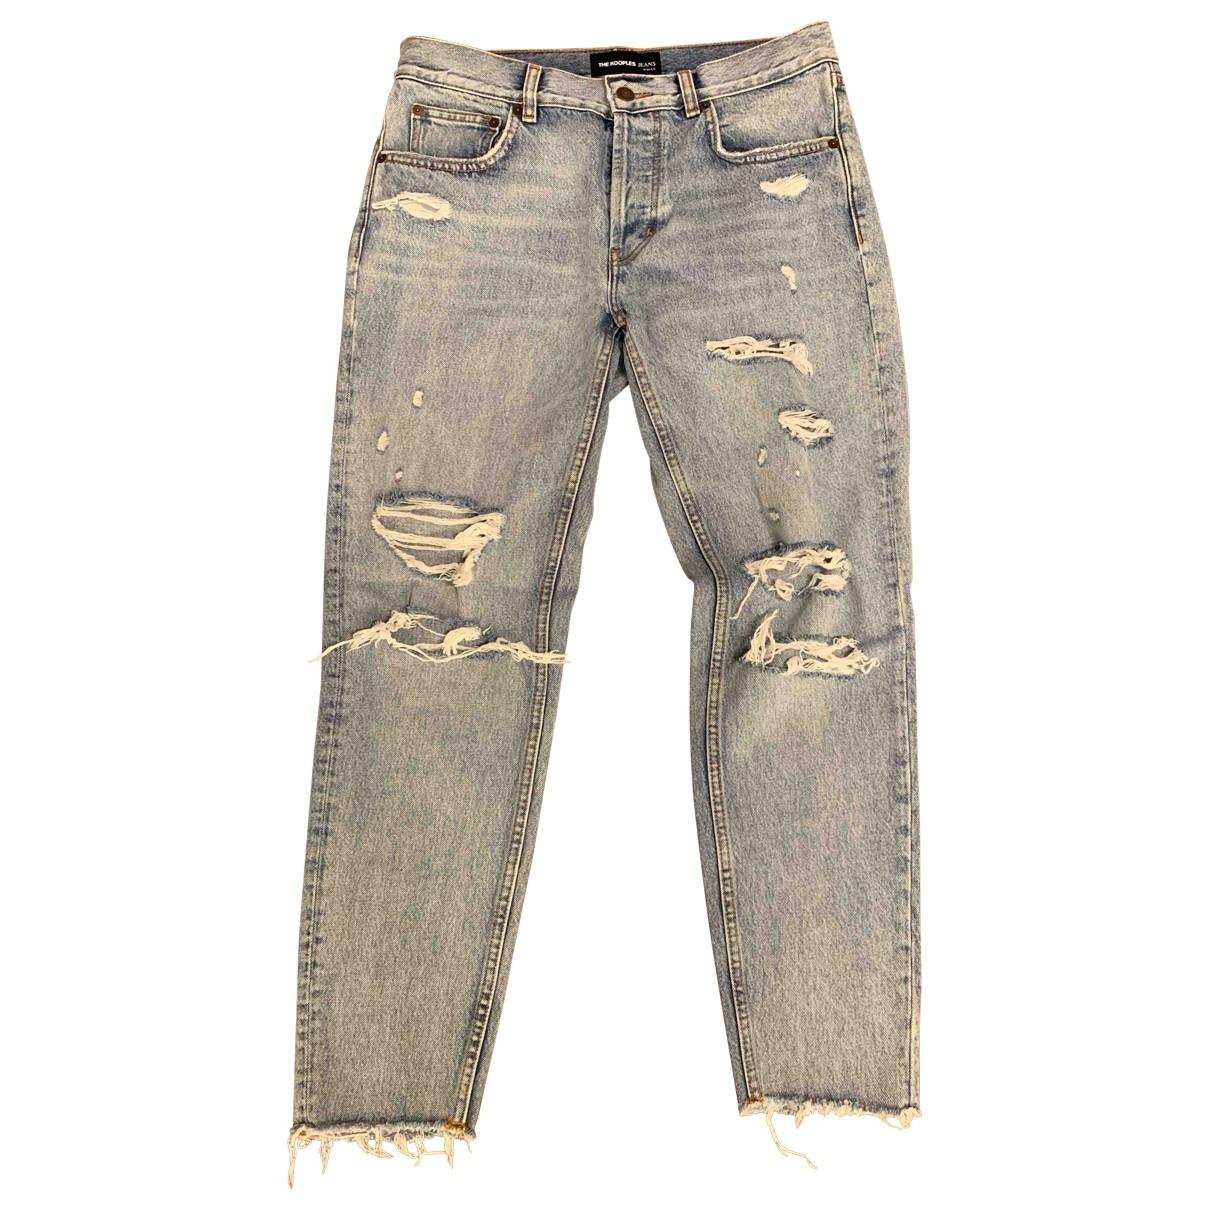 The Kooples Spring Summer 2019 Blue Denim - Jeans Jeans for Women 28 US